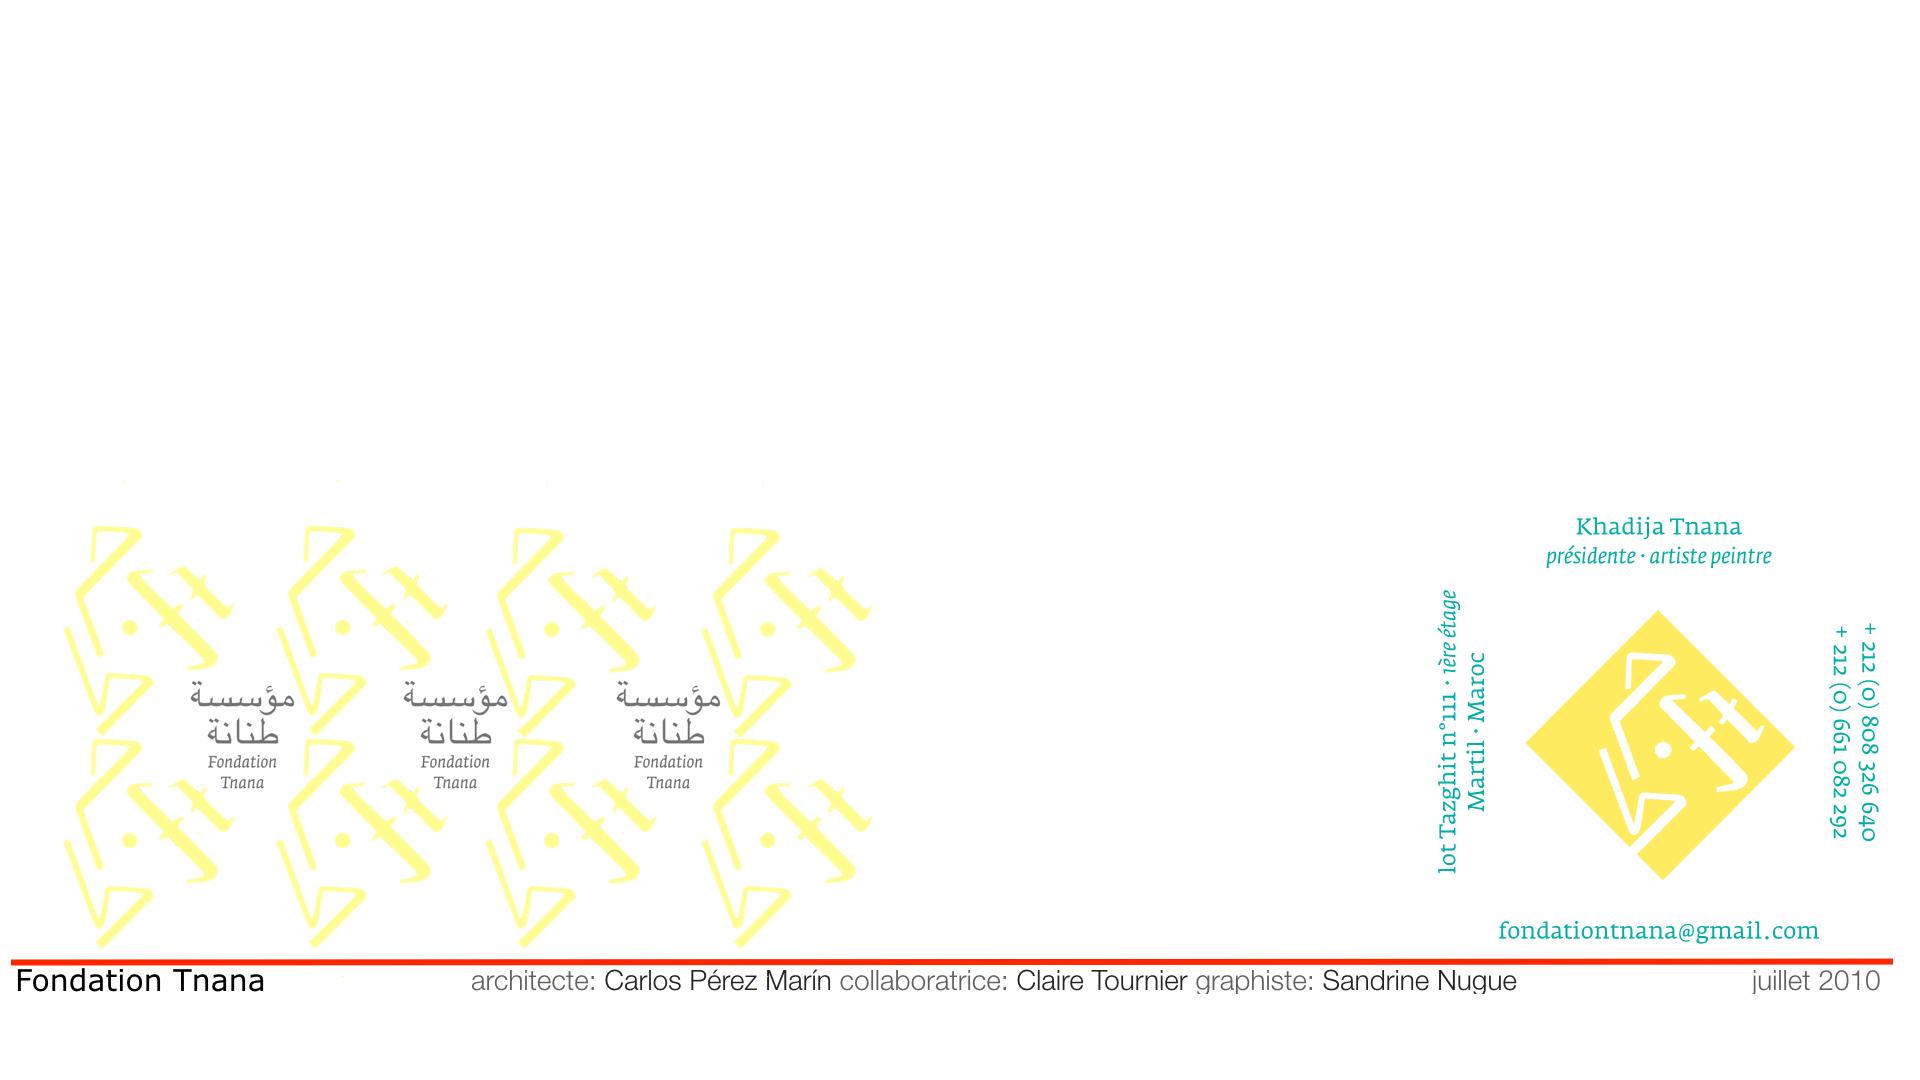 FONDATION TNANA DOSSIER PDF 10.08.17.038.jpeg